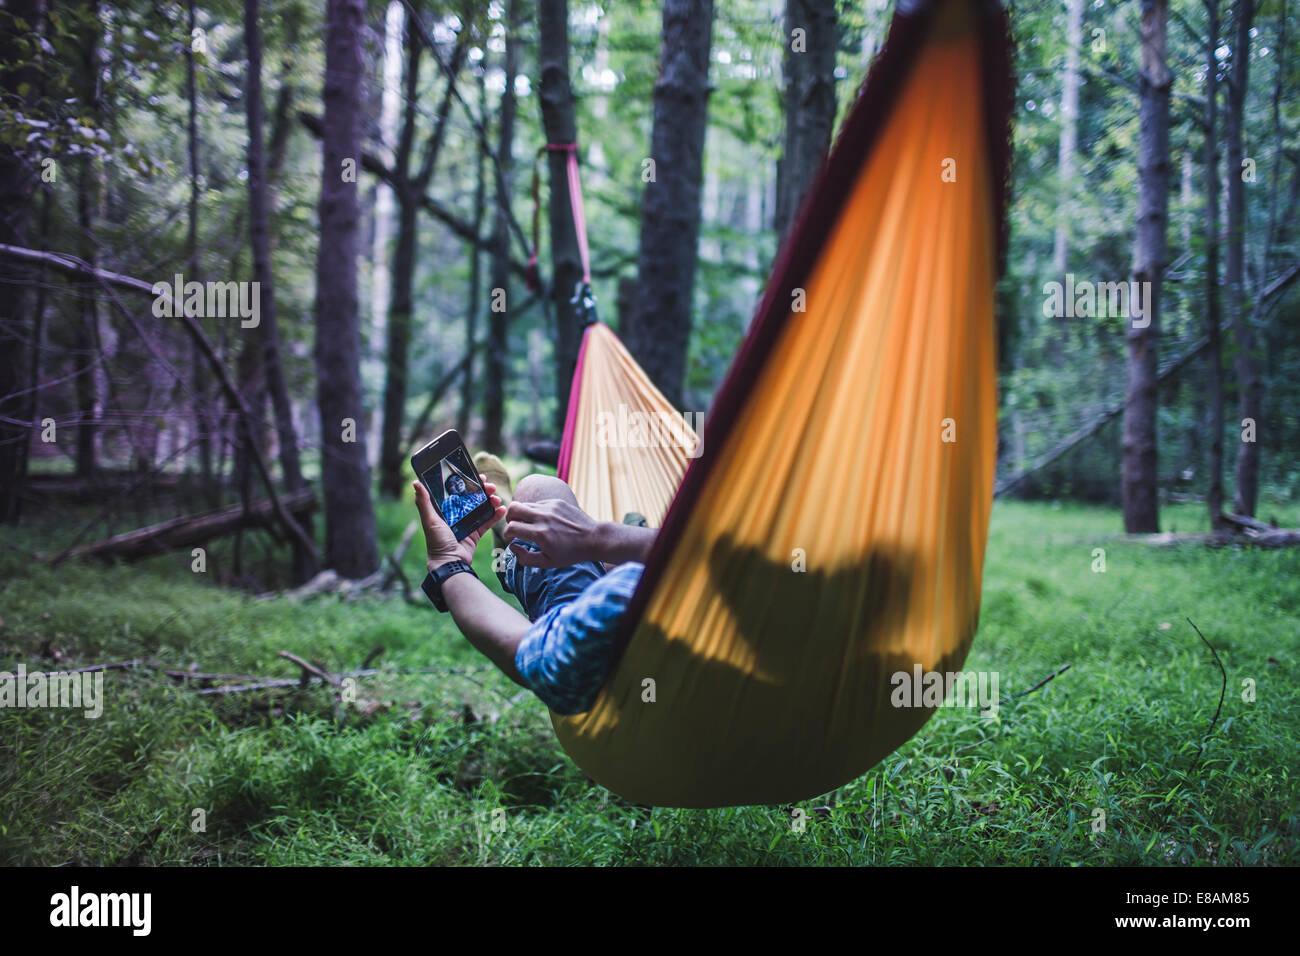 Hiker lying in hammock in forest using digital device - Stock Image